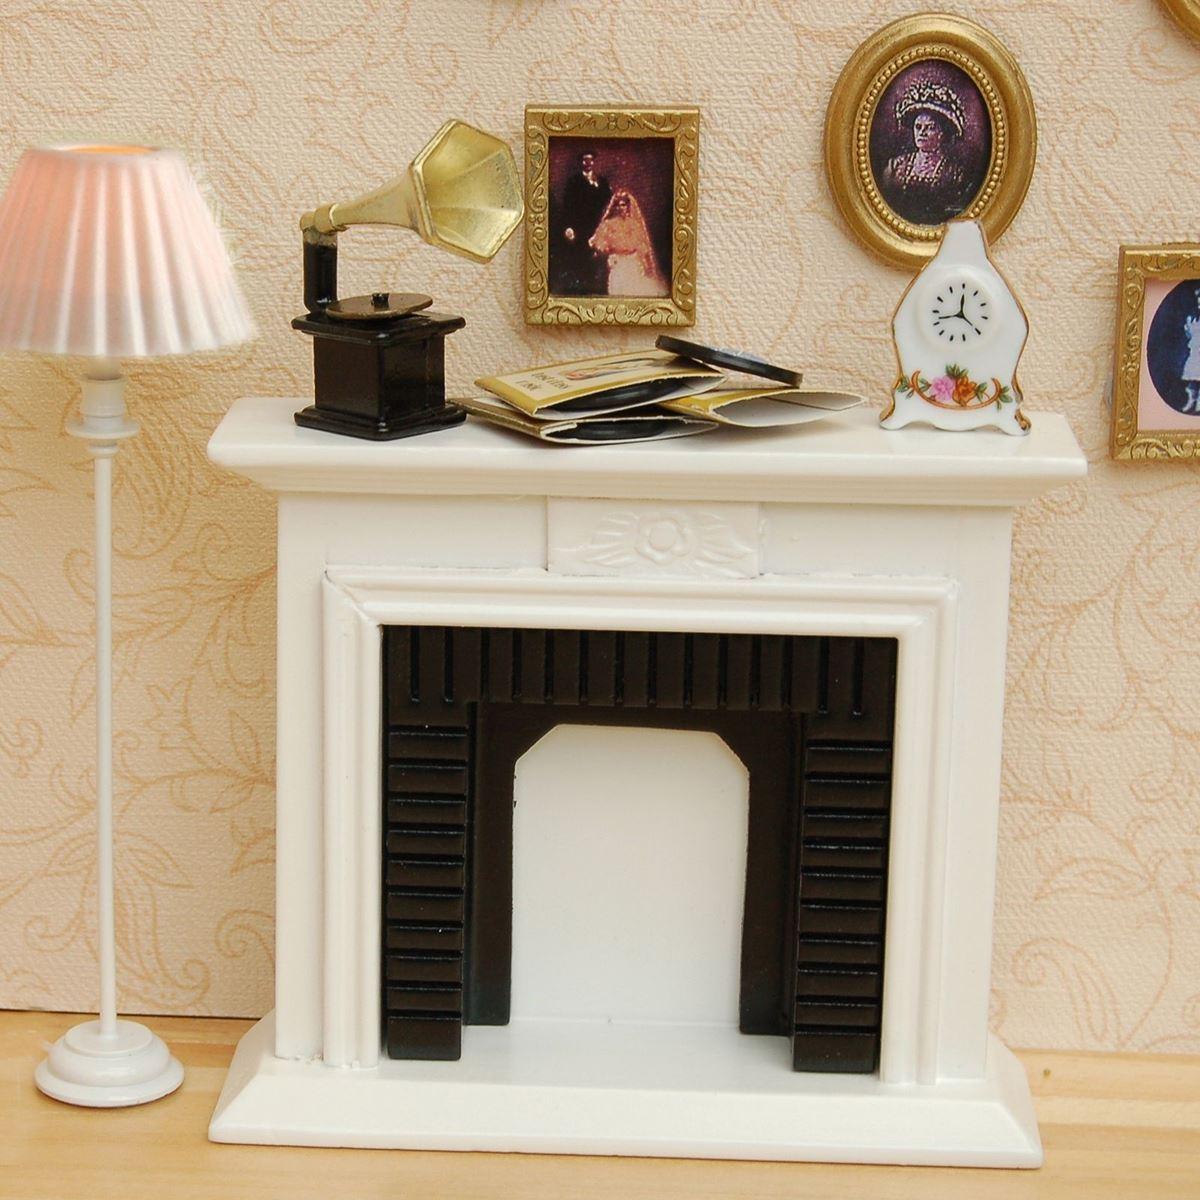 1/12 Scale DIY Handmade Miniature White Fireplace